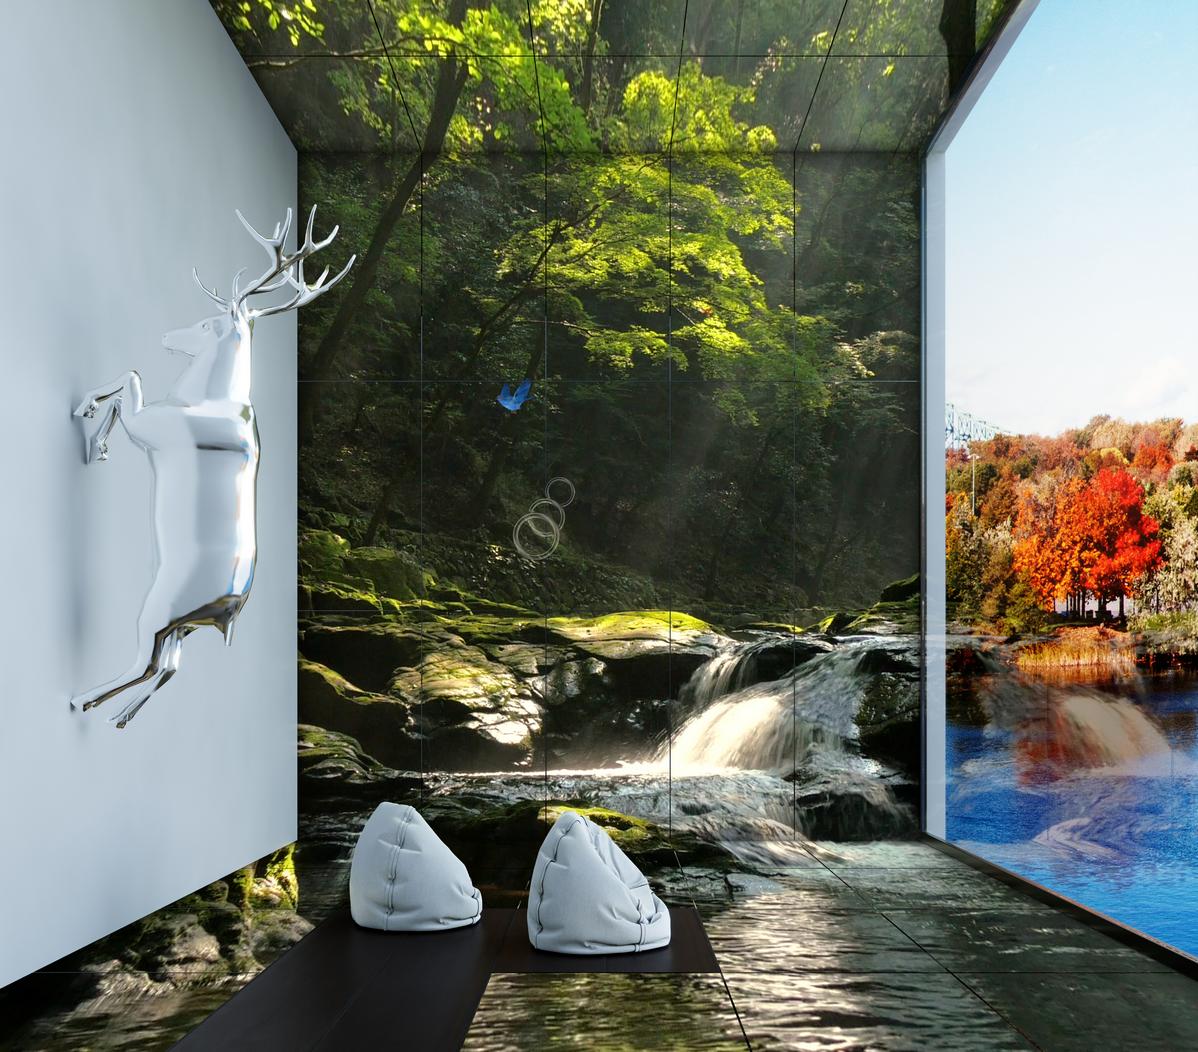 OLED로 완성한 예술, 미디어아트로 자연을 만나다.